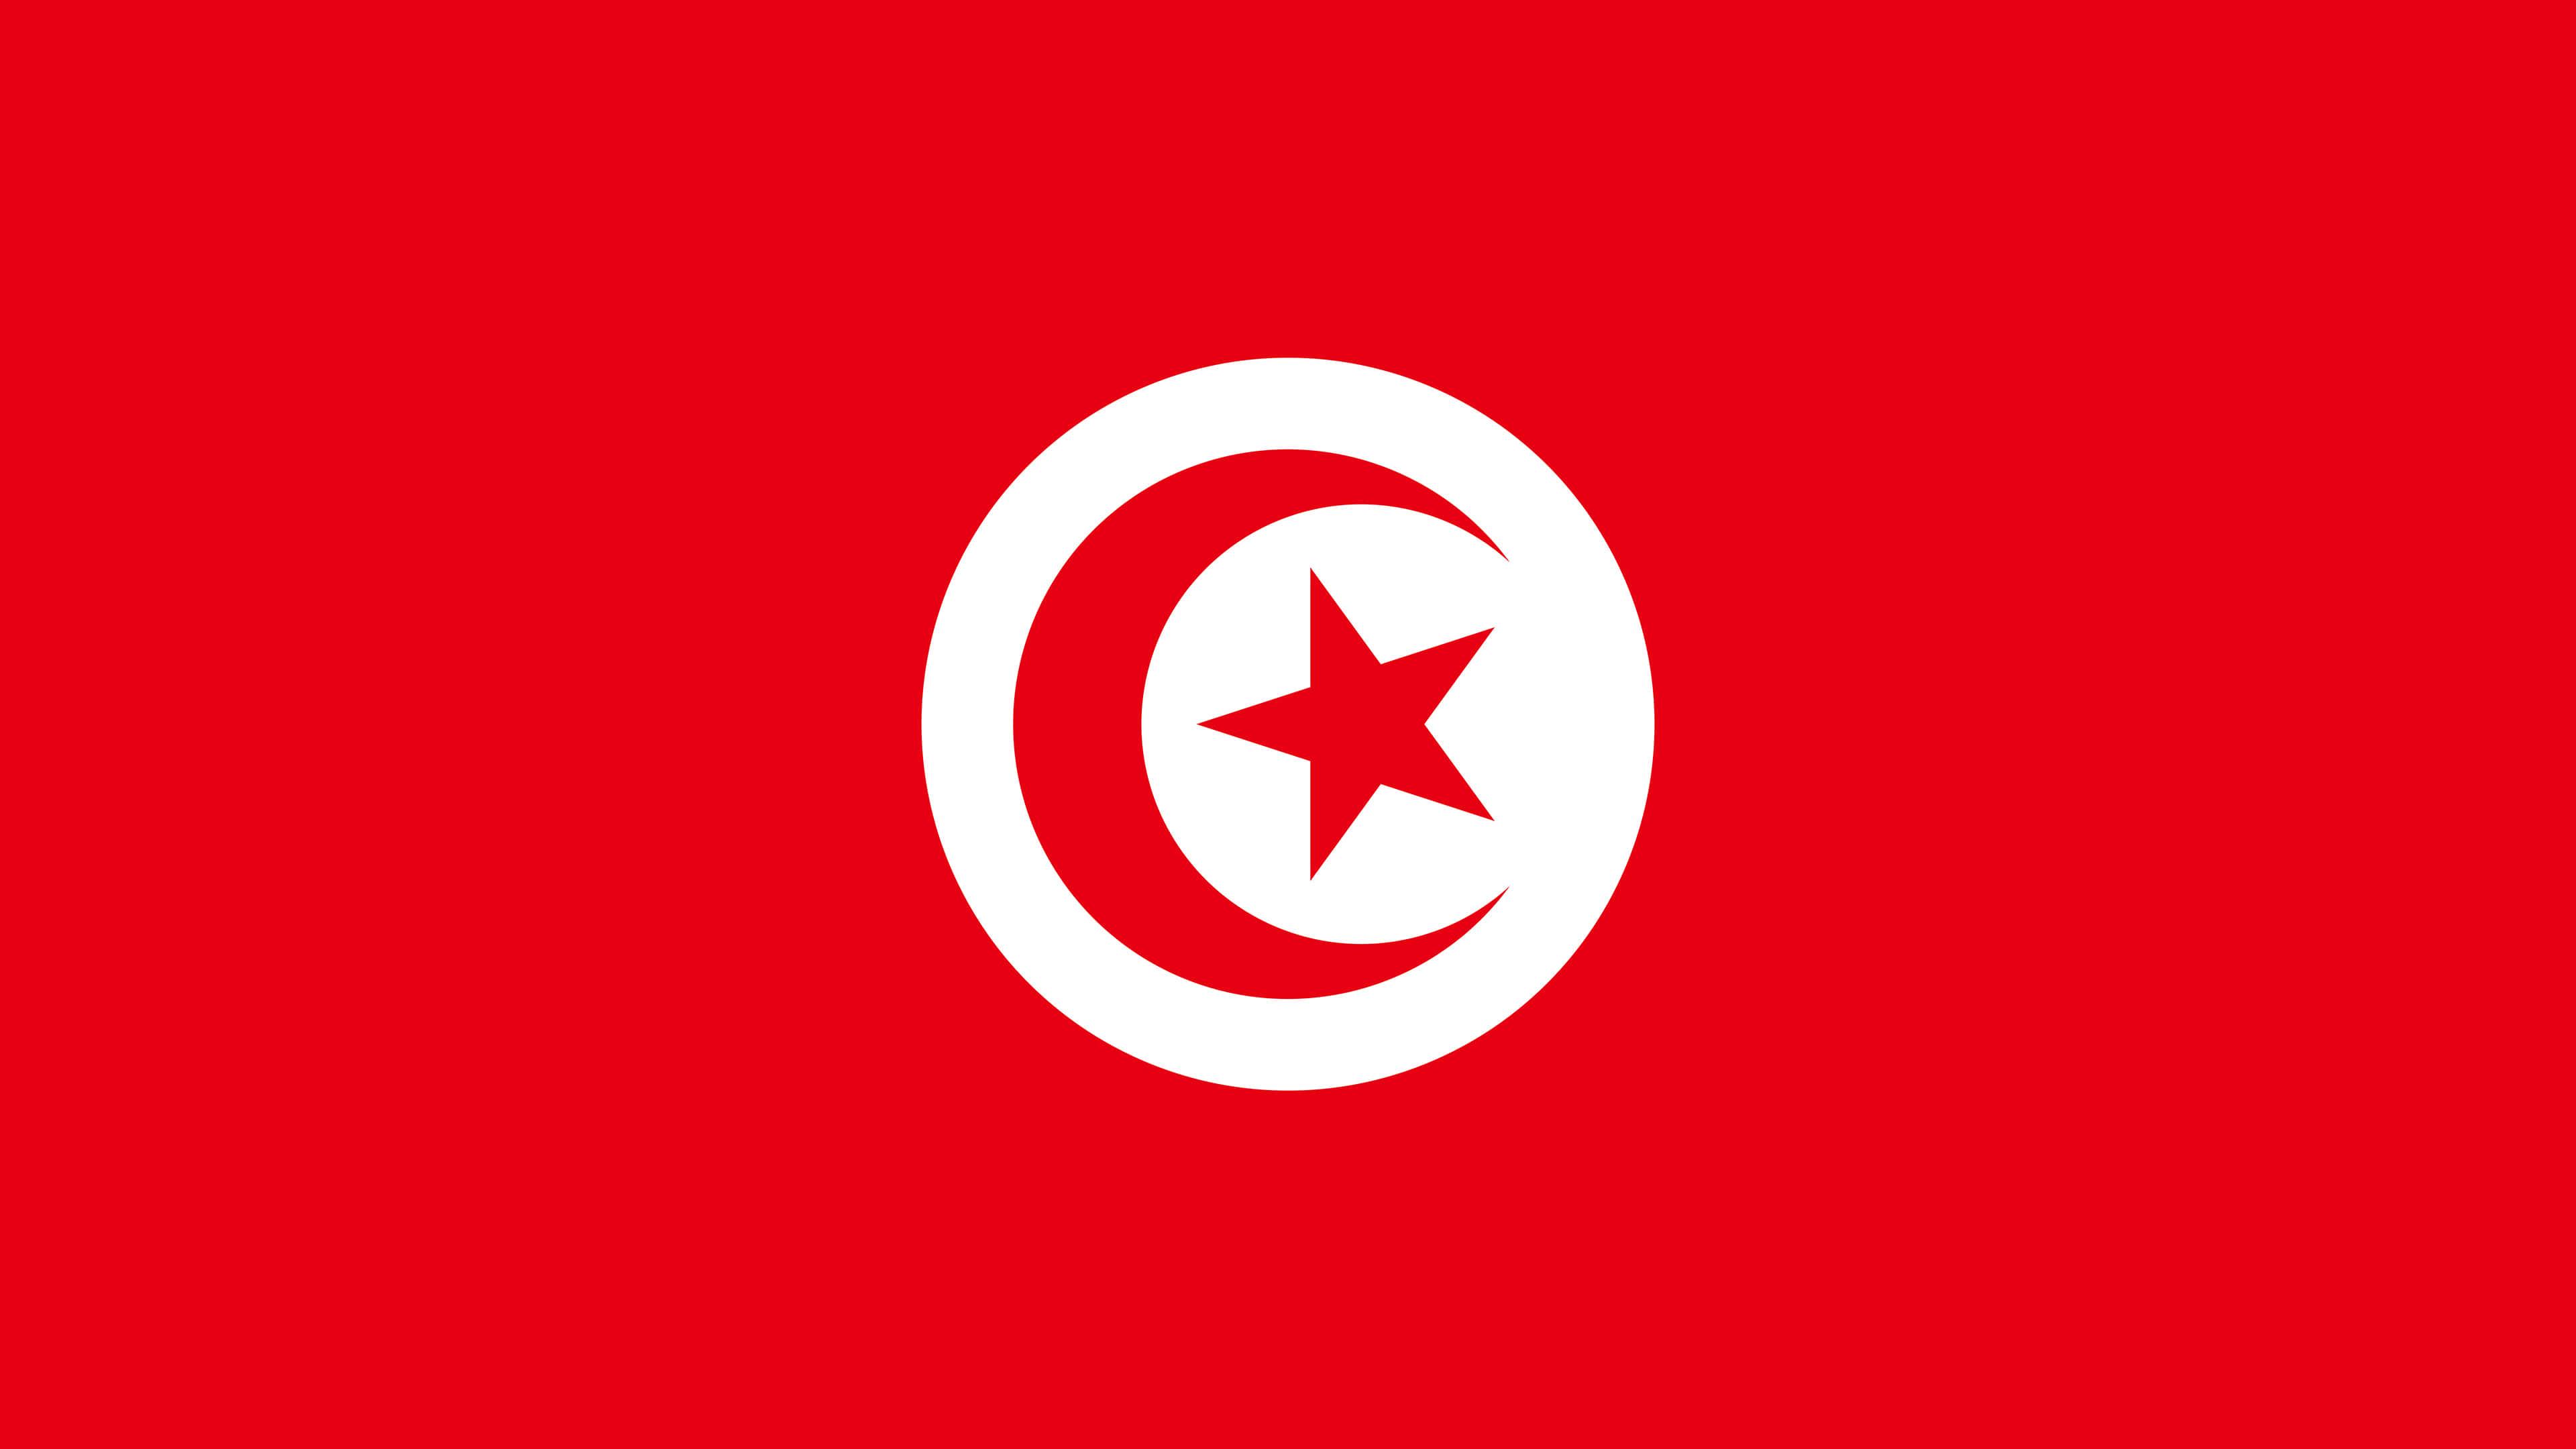 tunisia flag uhd 4k wallpaper